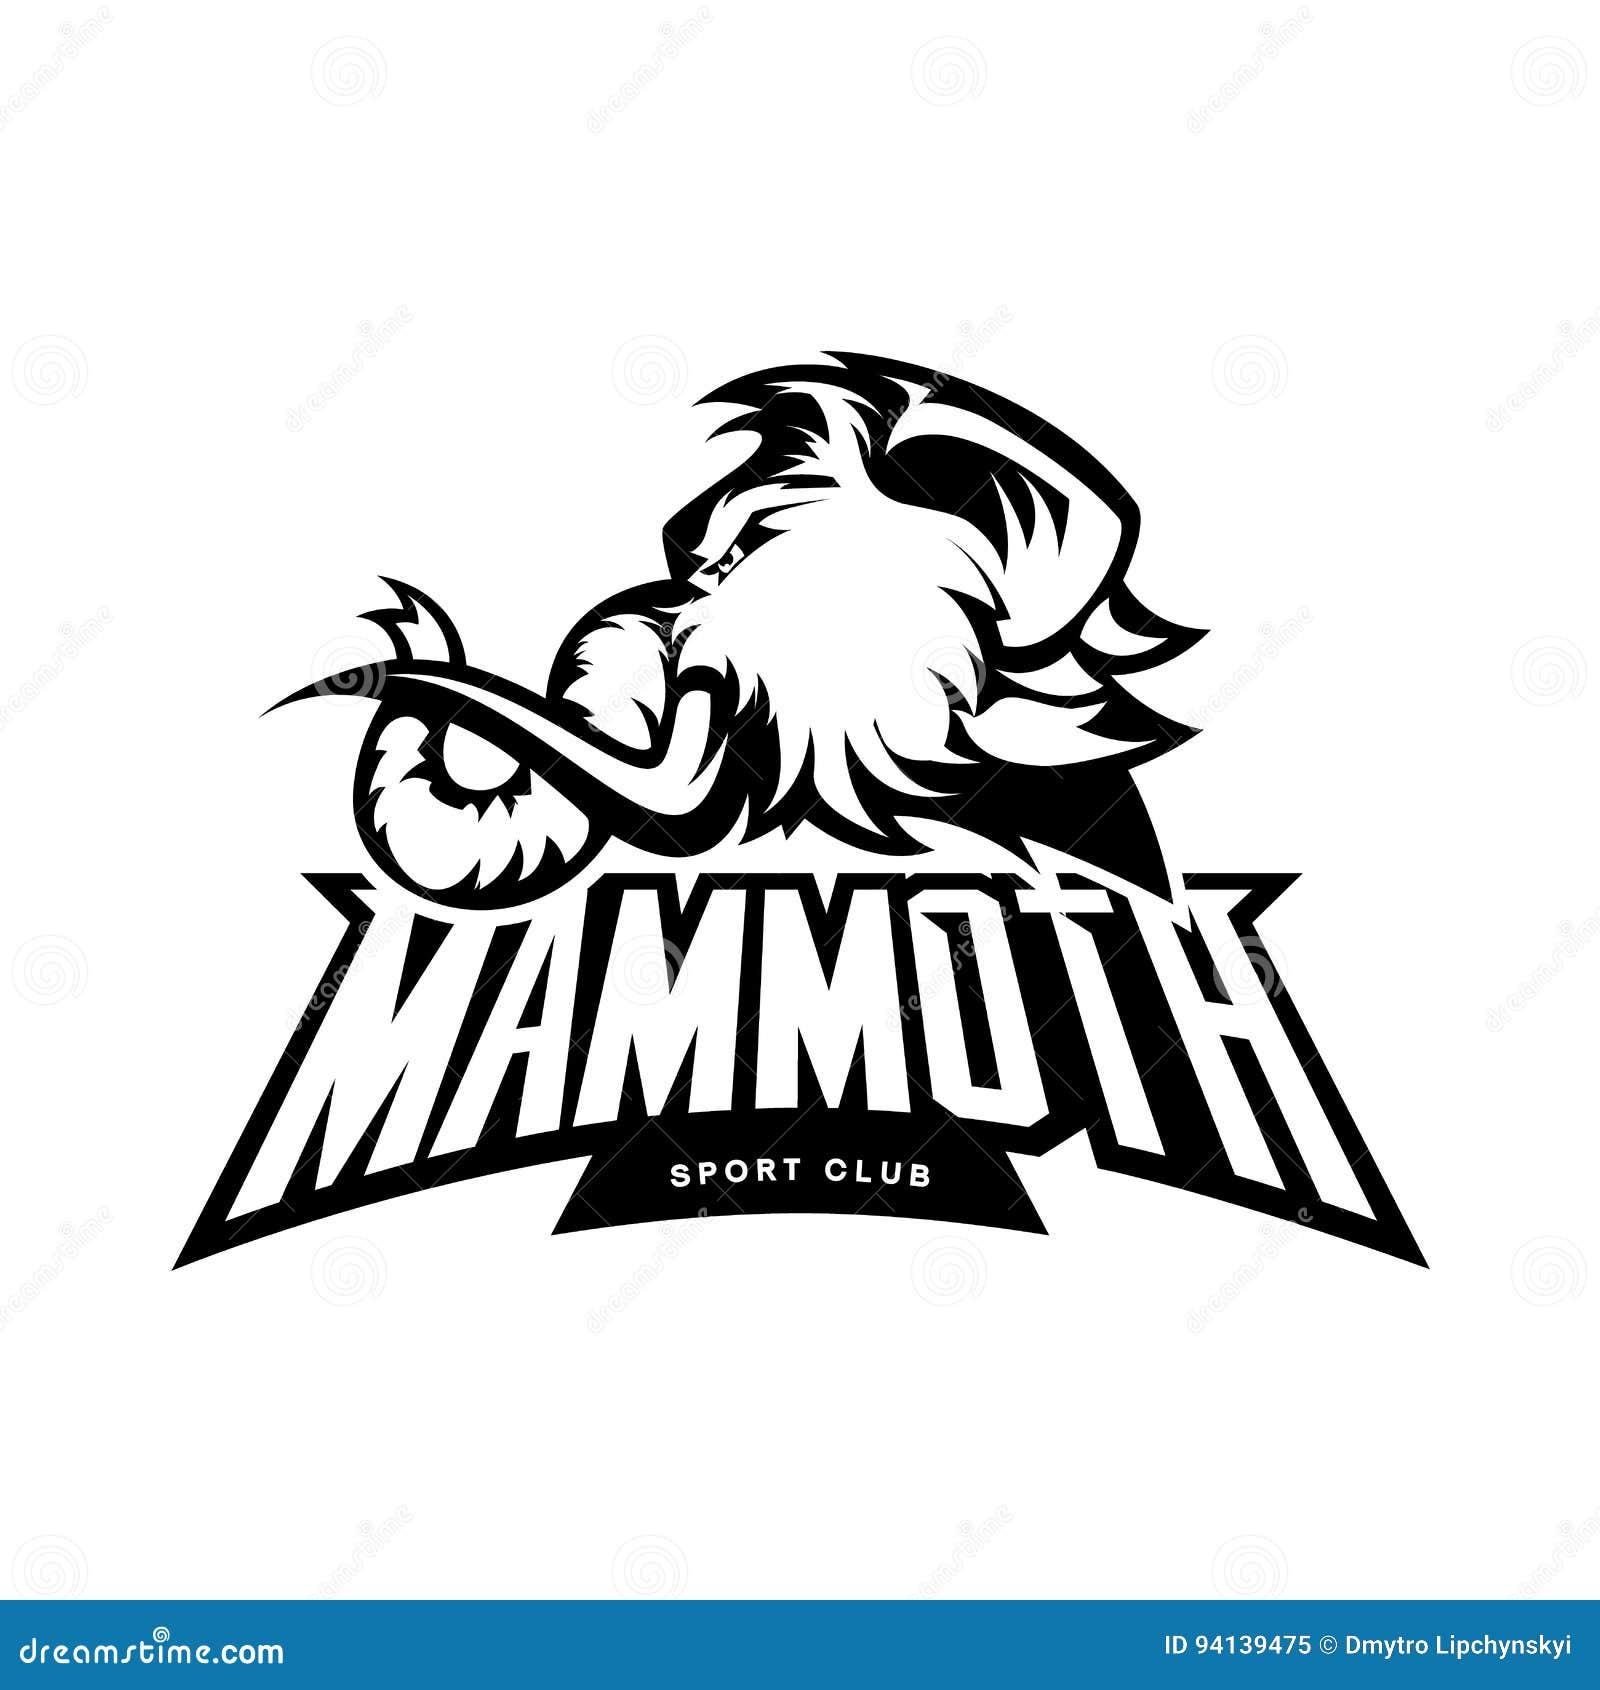 Mamota in english